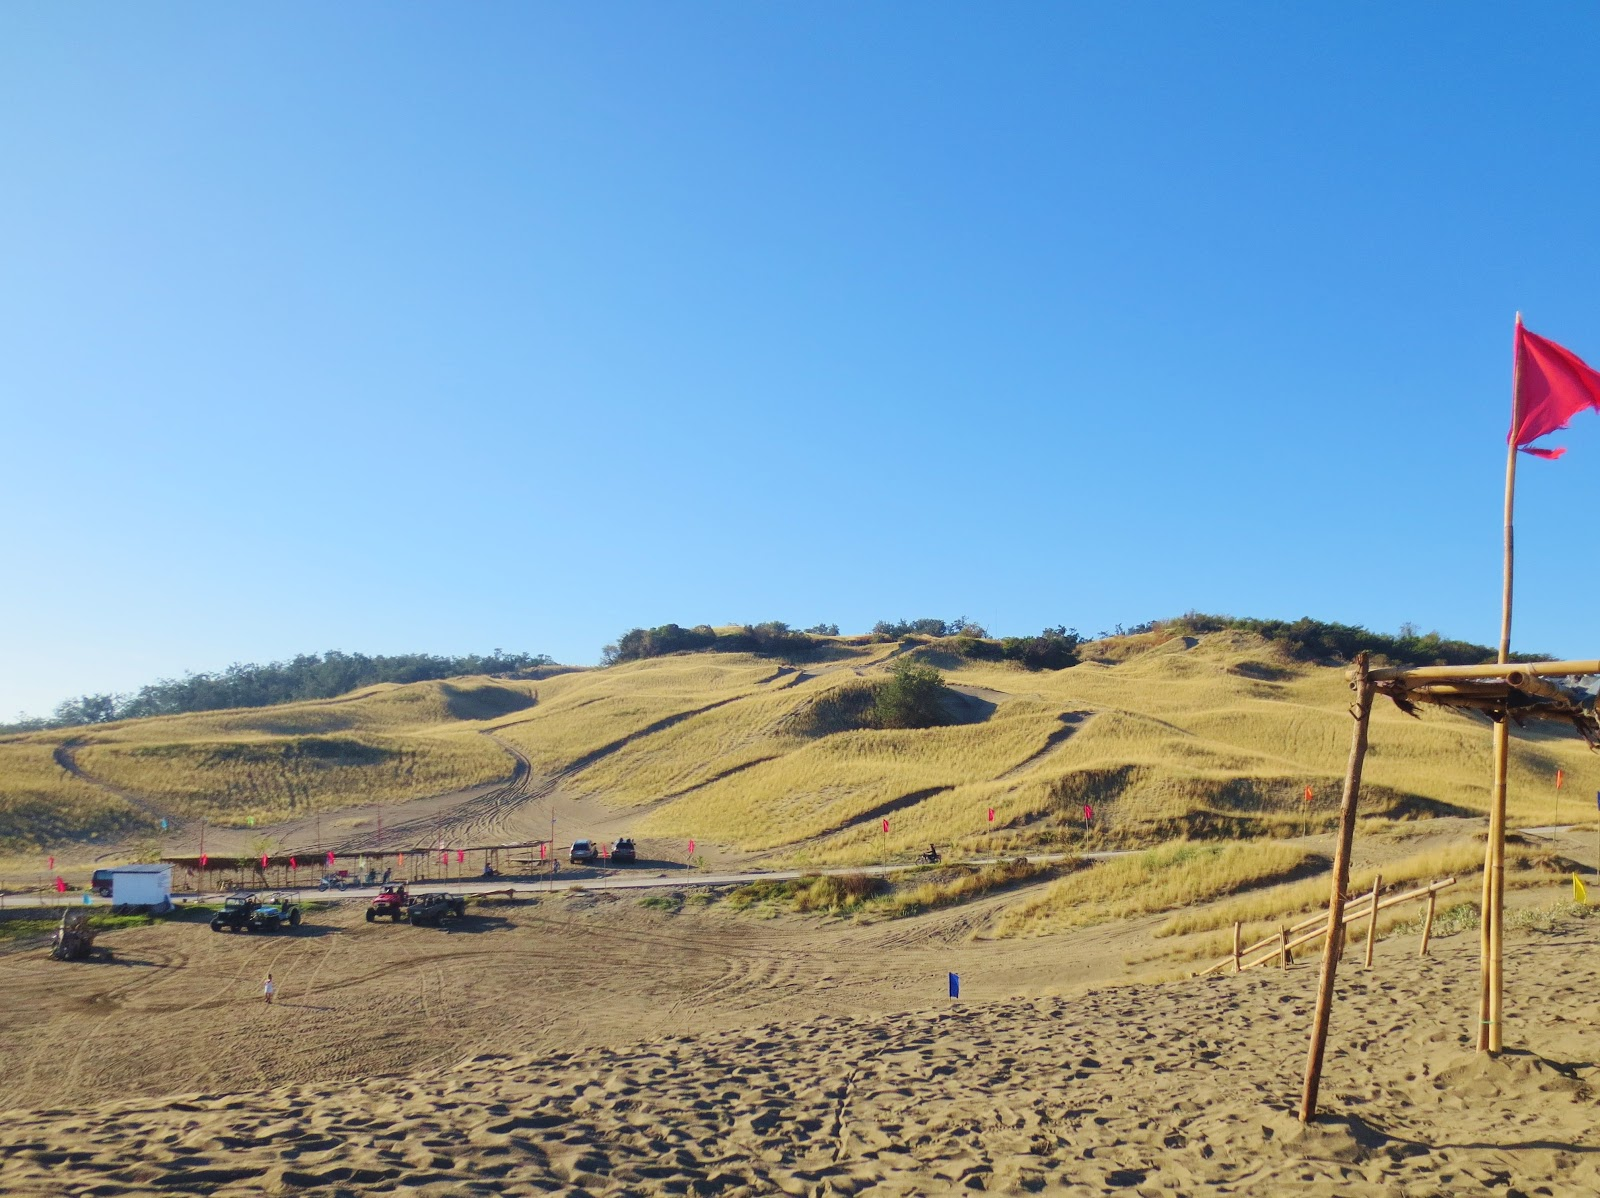 La Paz Sand Dunes, Ilocos Norte